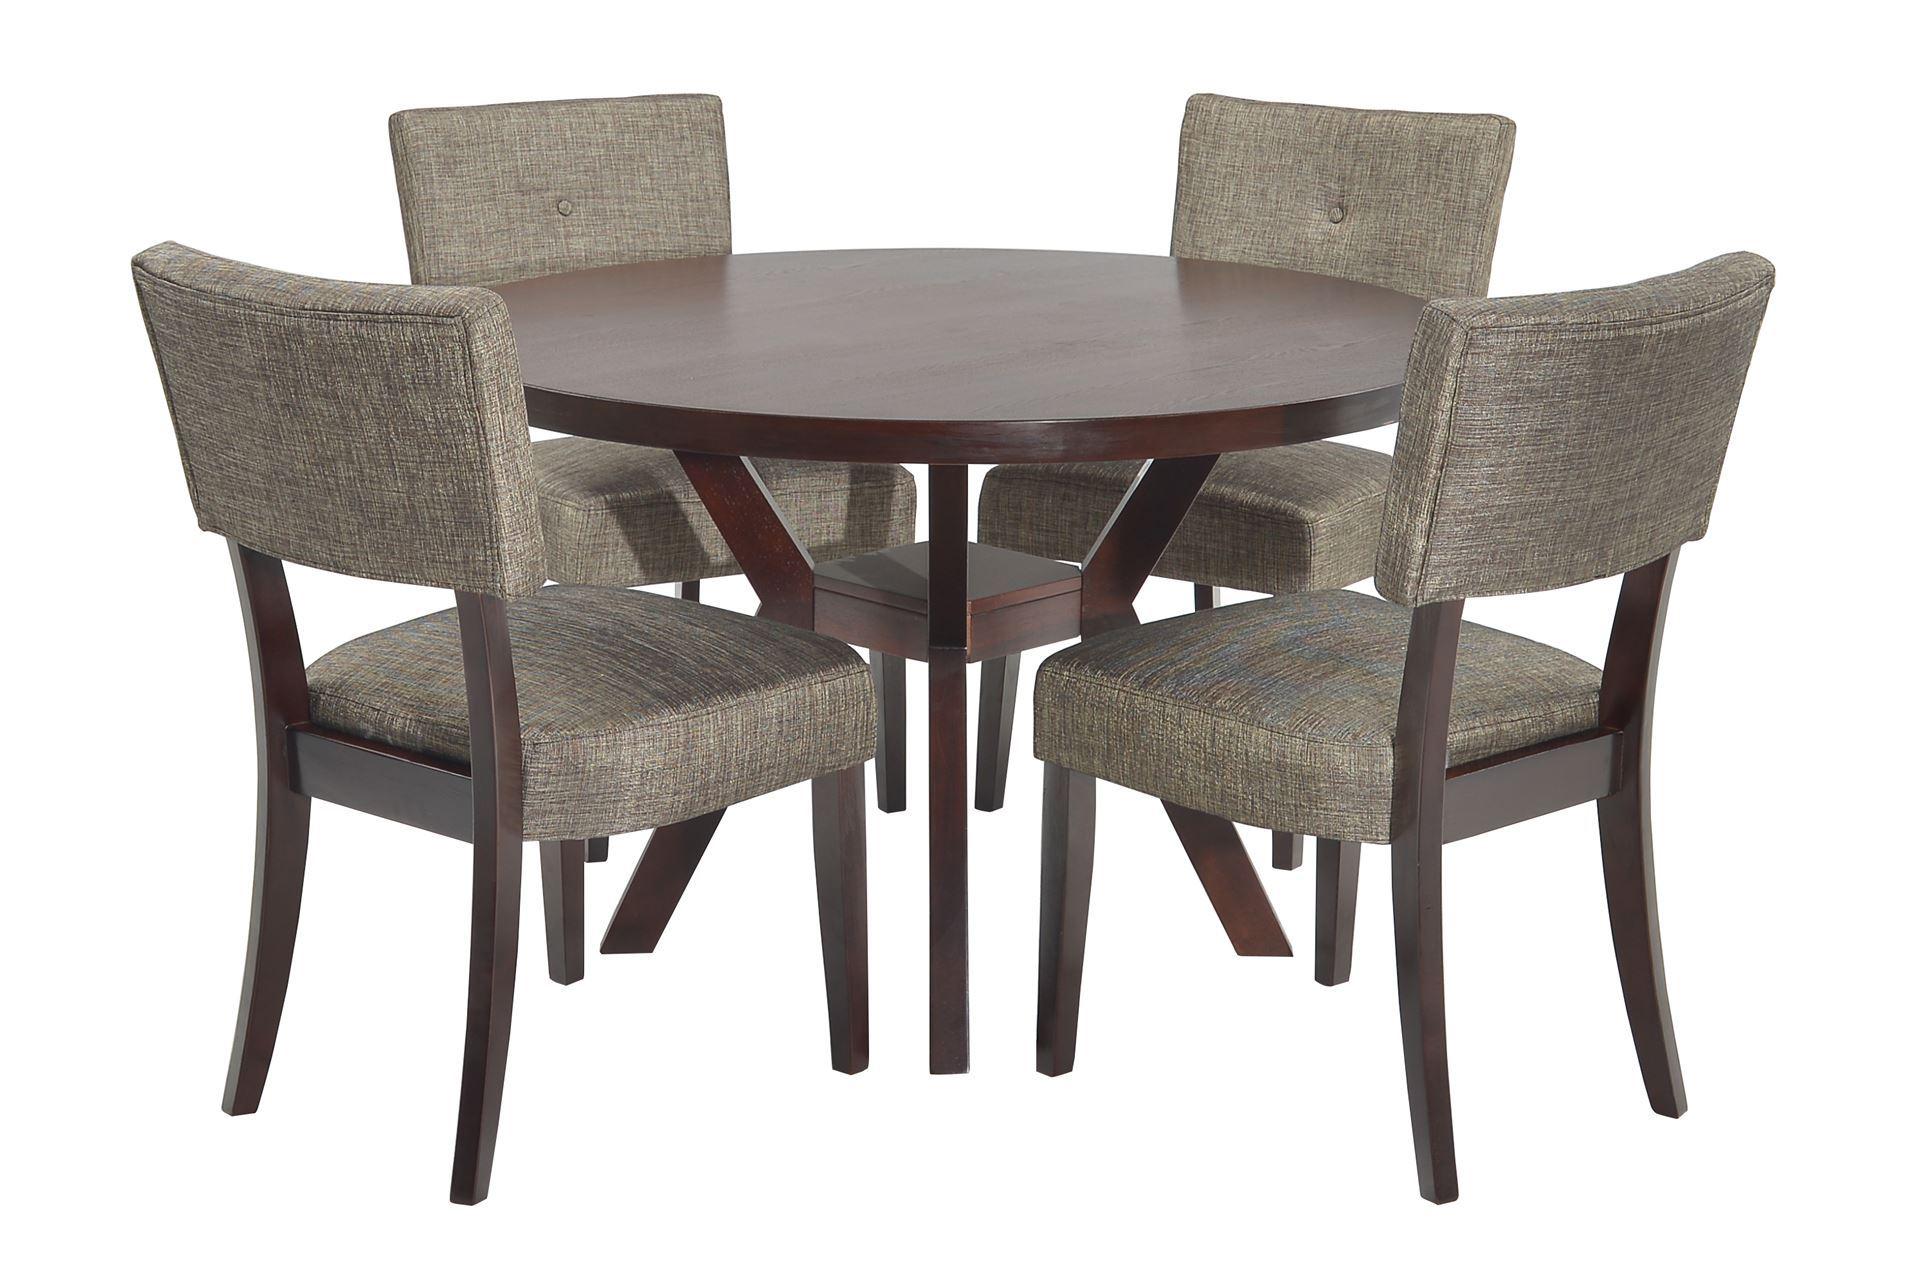 Macie 5 Piece Round Dining Set - Living Spaces